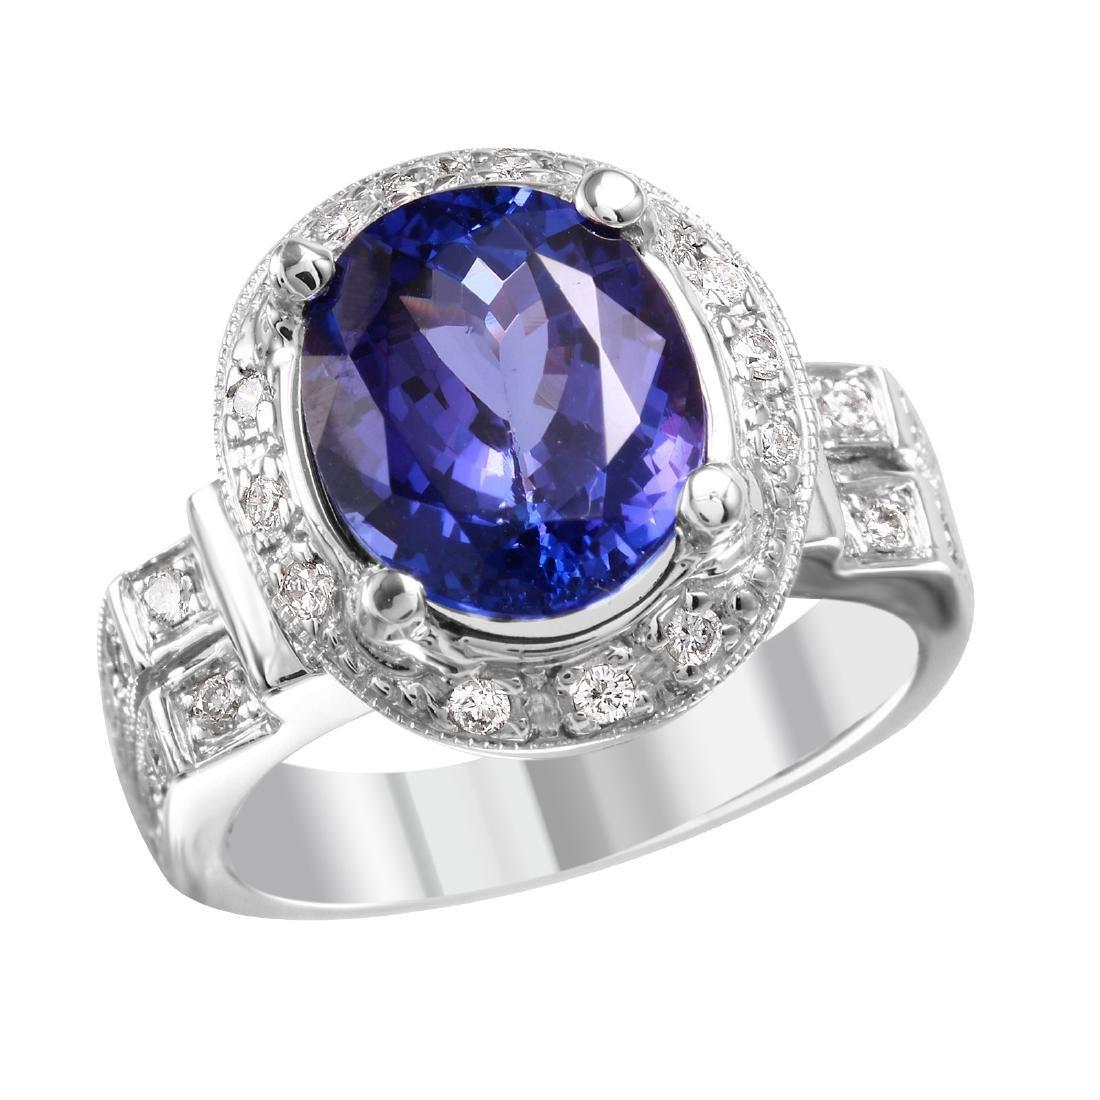 18KT White Gold Tanzanite & Diamond Ring